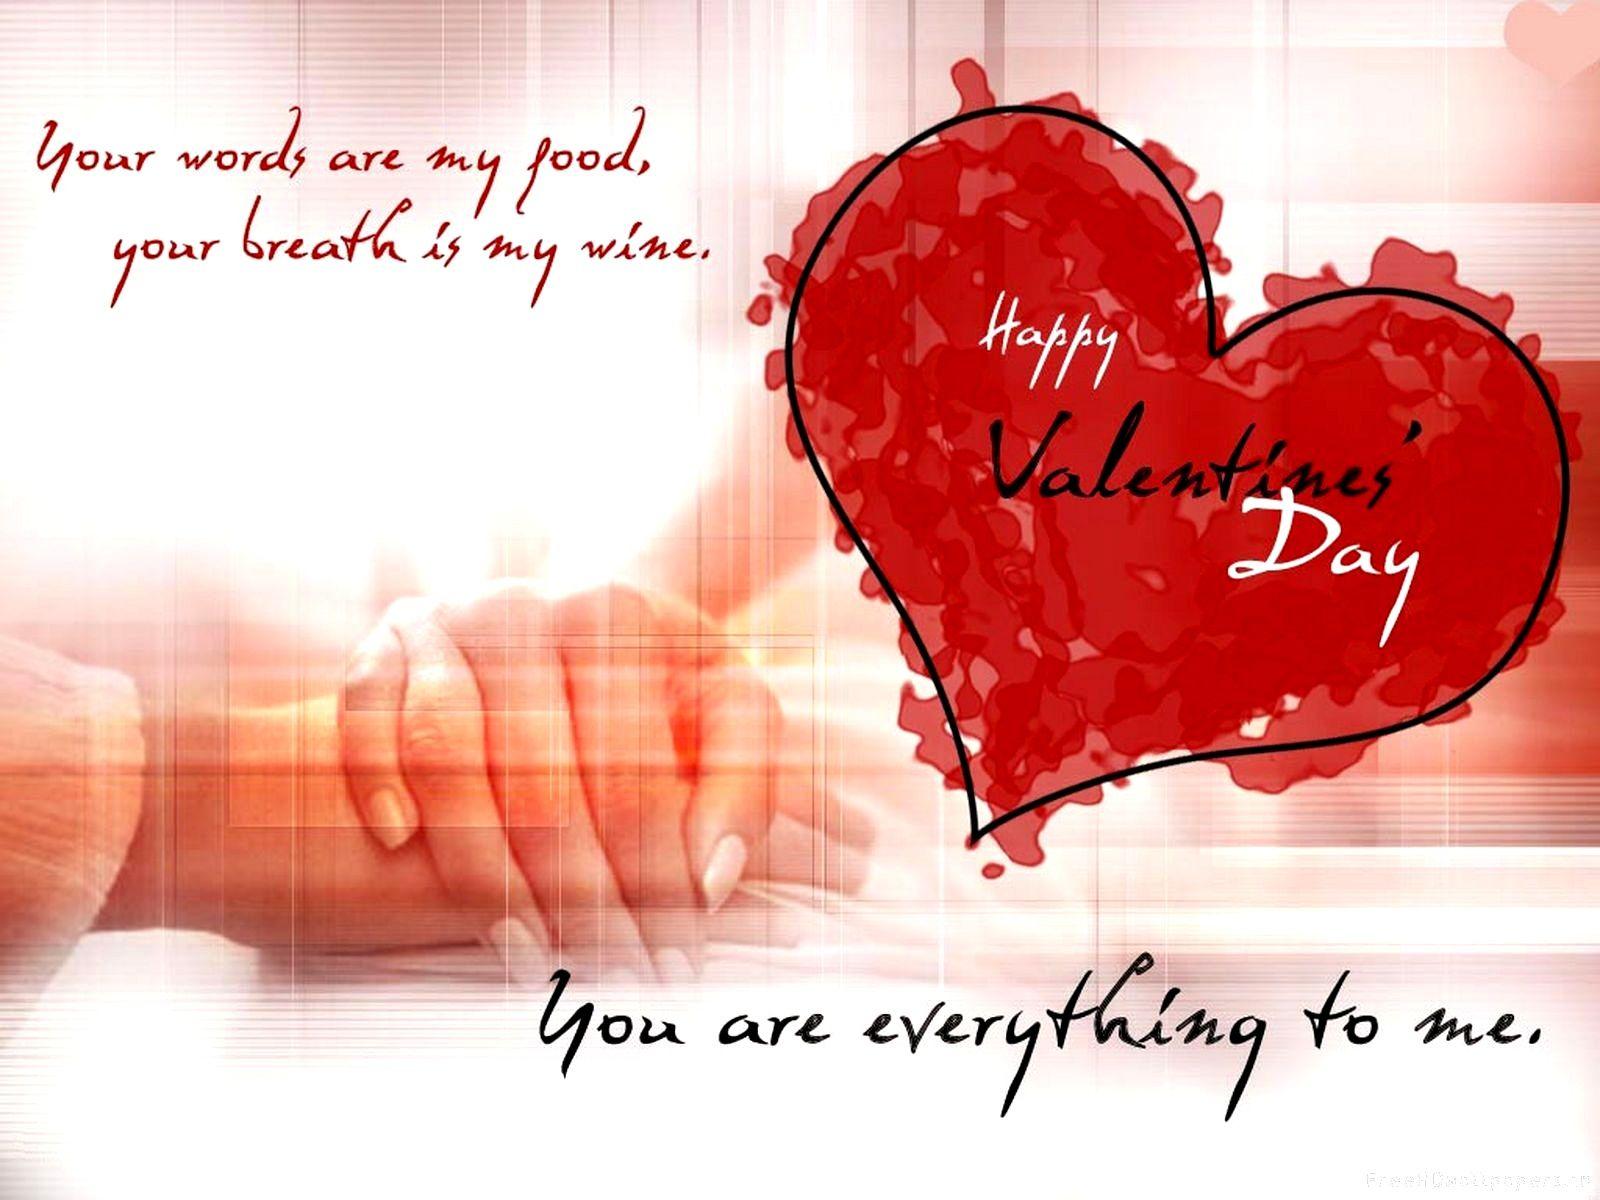 Valentinesdaycardsbeautifulvalentinesdayg 16001200 explore funny valentine valentines day greetings and more m4hsunfo Choice Image